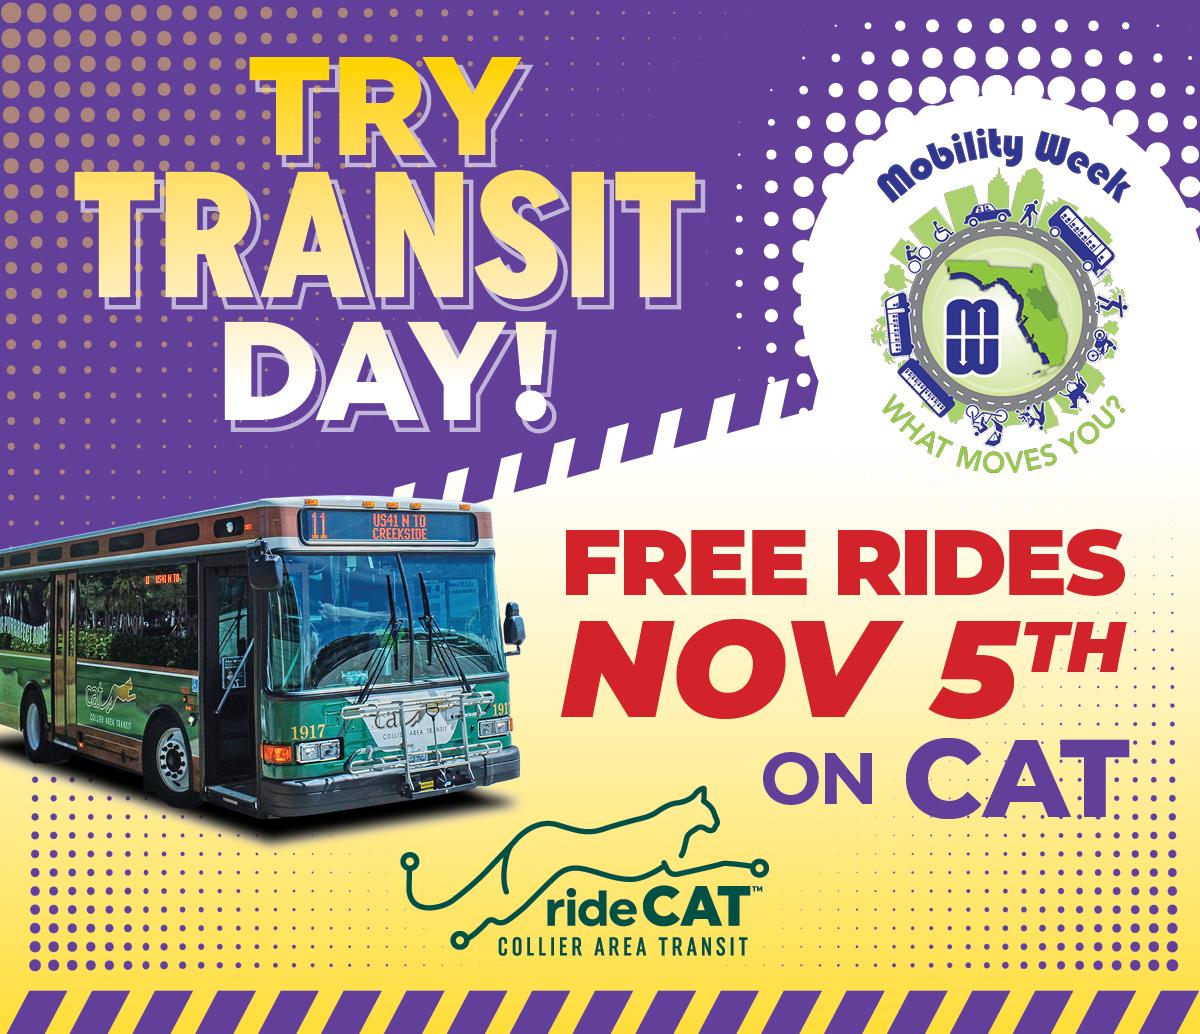 Try Transit Day! Free rides on Friday, November 5, 2021